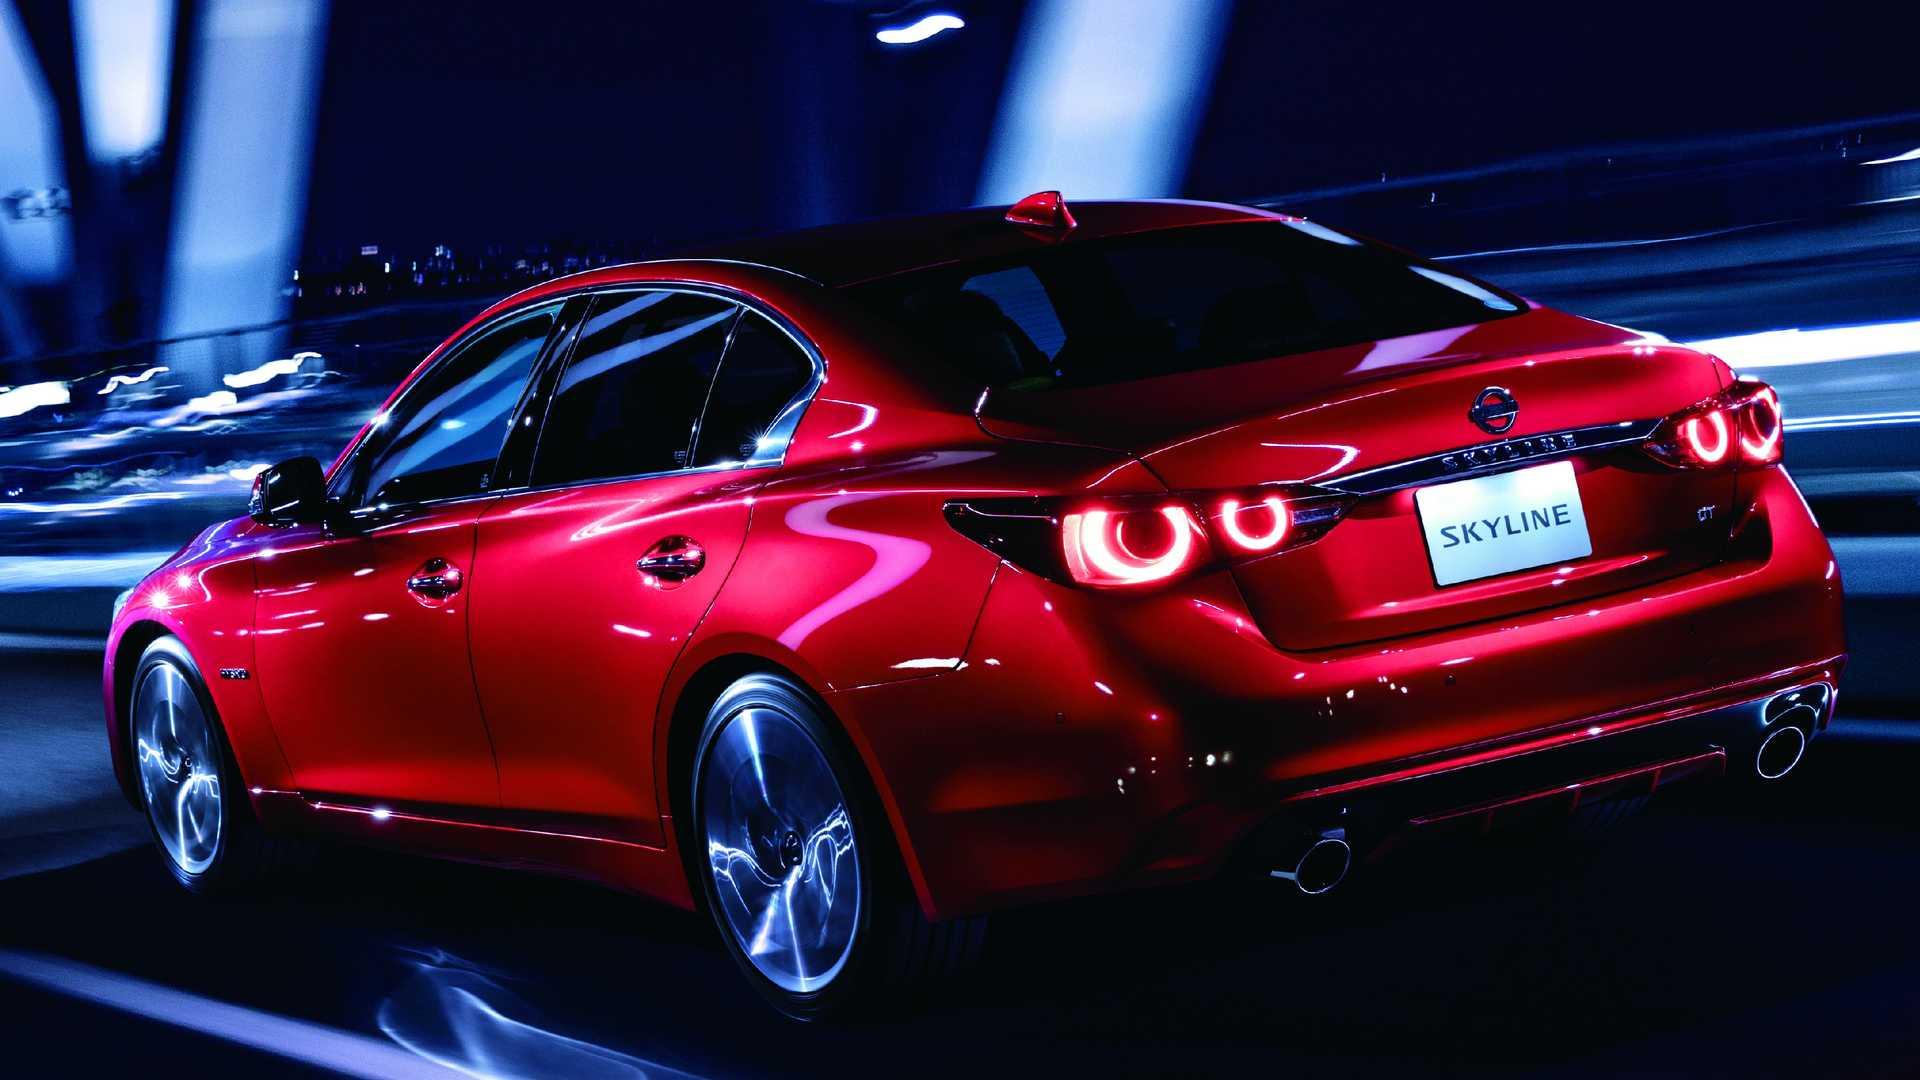 Nissan замаскировала седан Skyline под GT-R 1